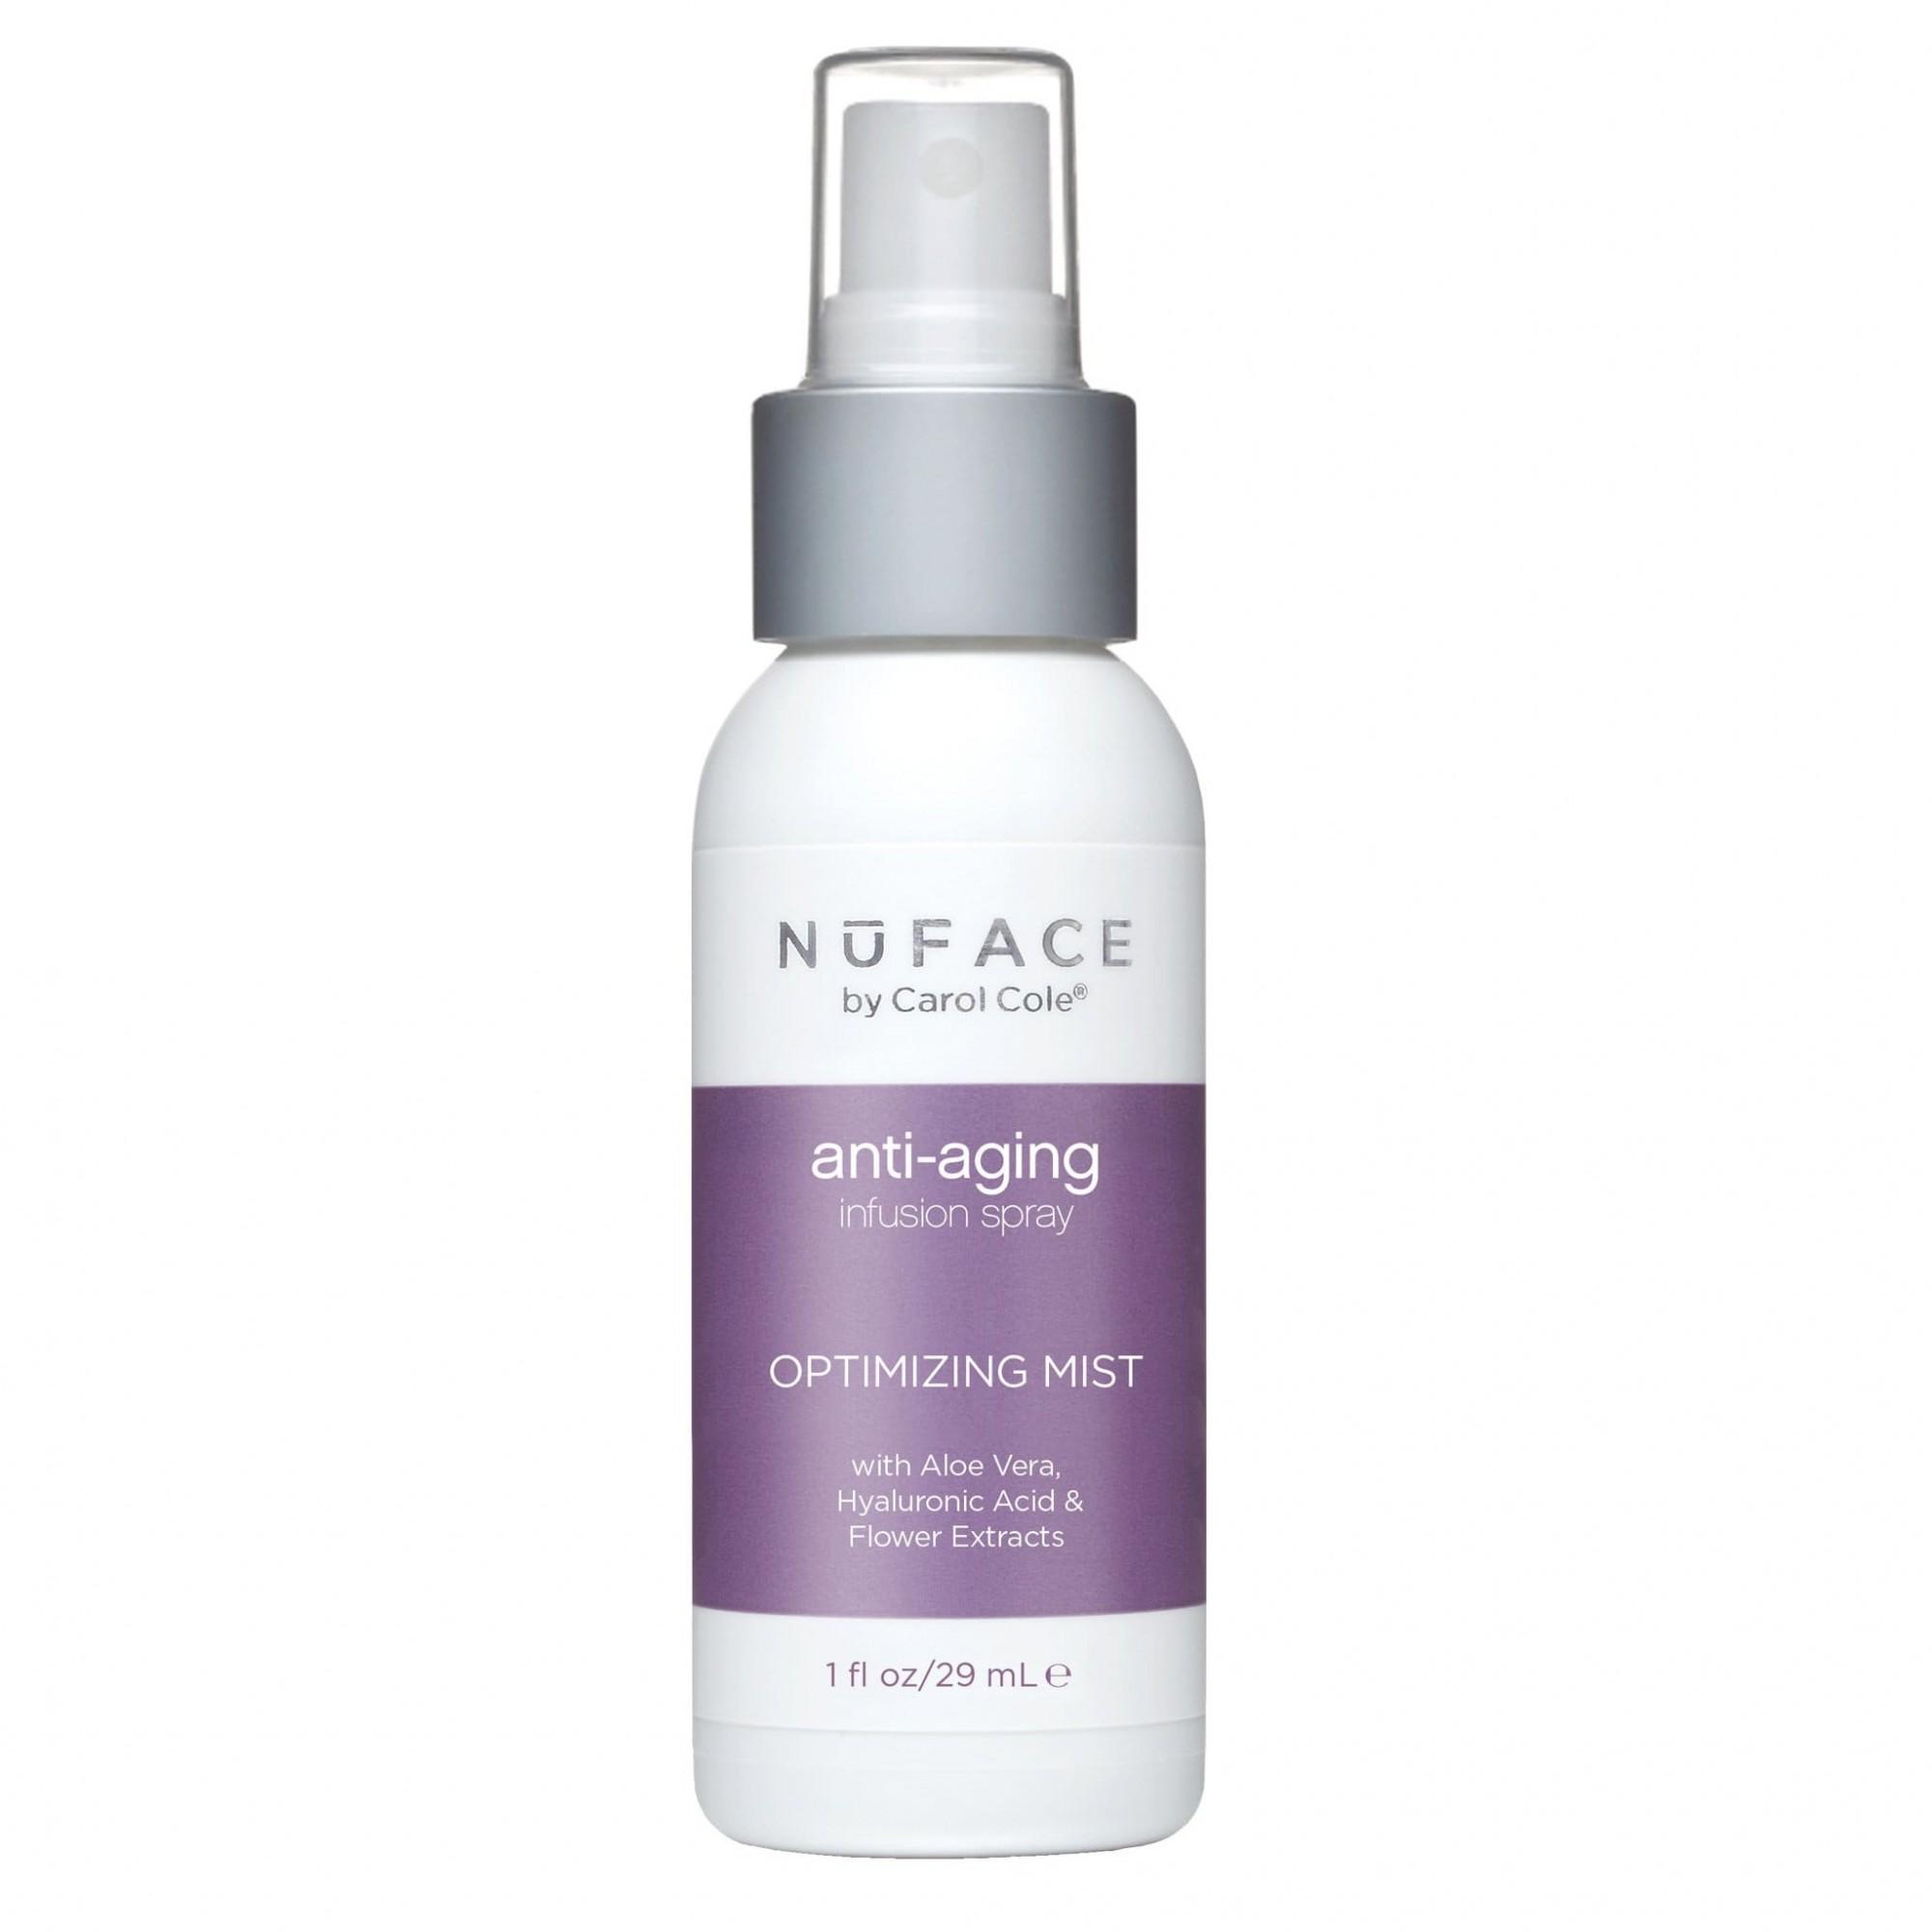 Nuface Optimizing Mist Infusion Spray 29 mL